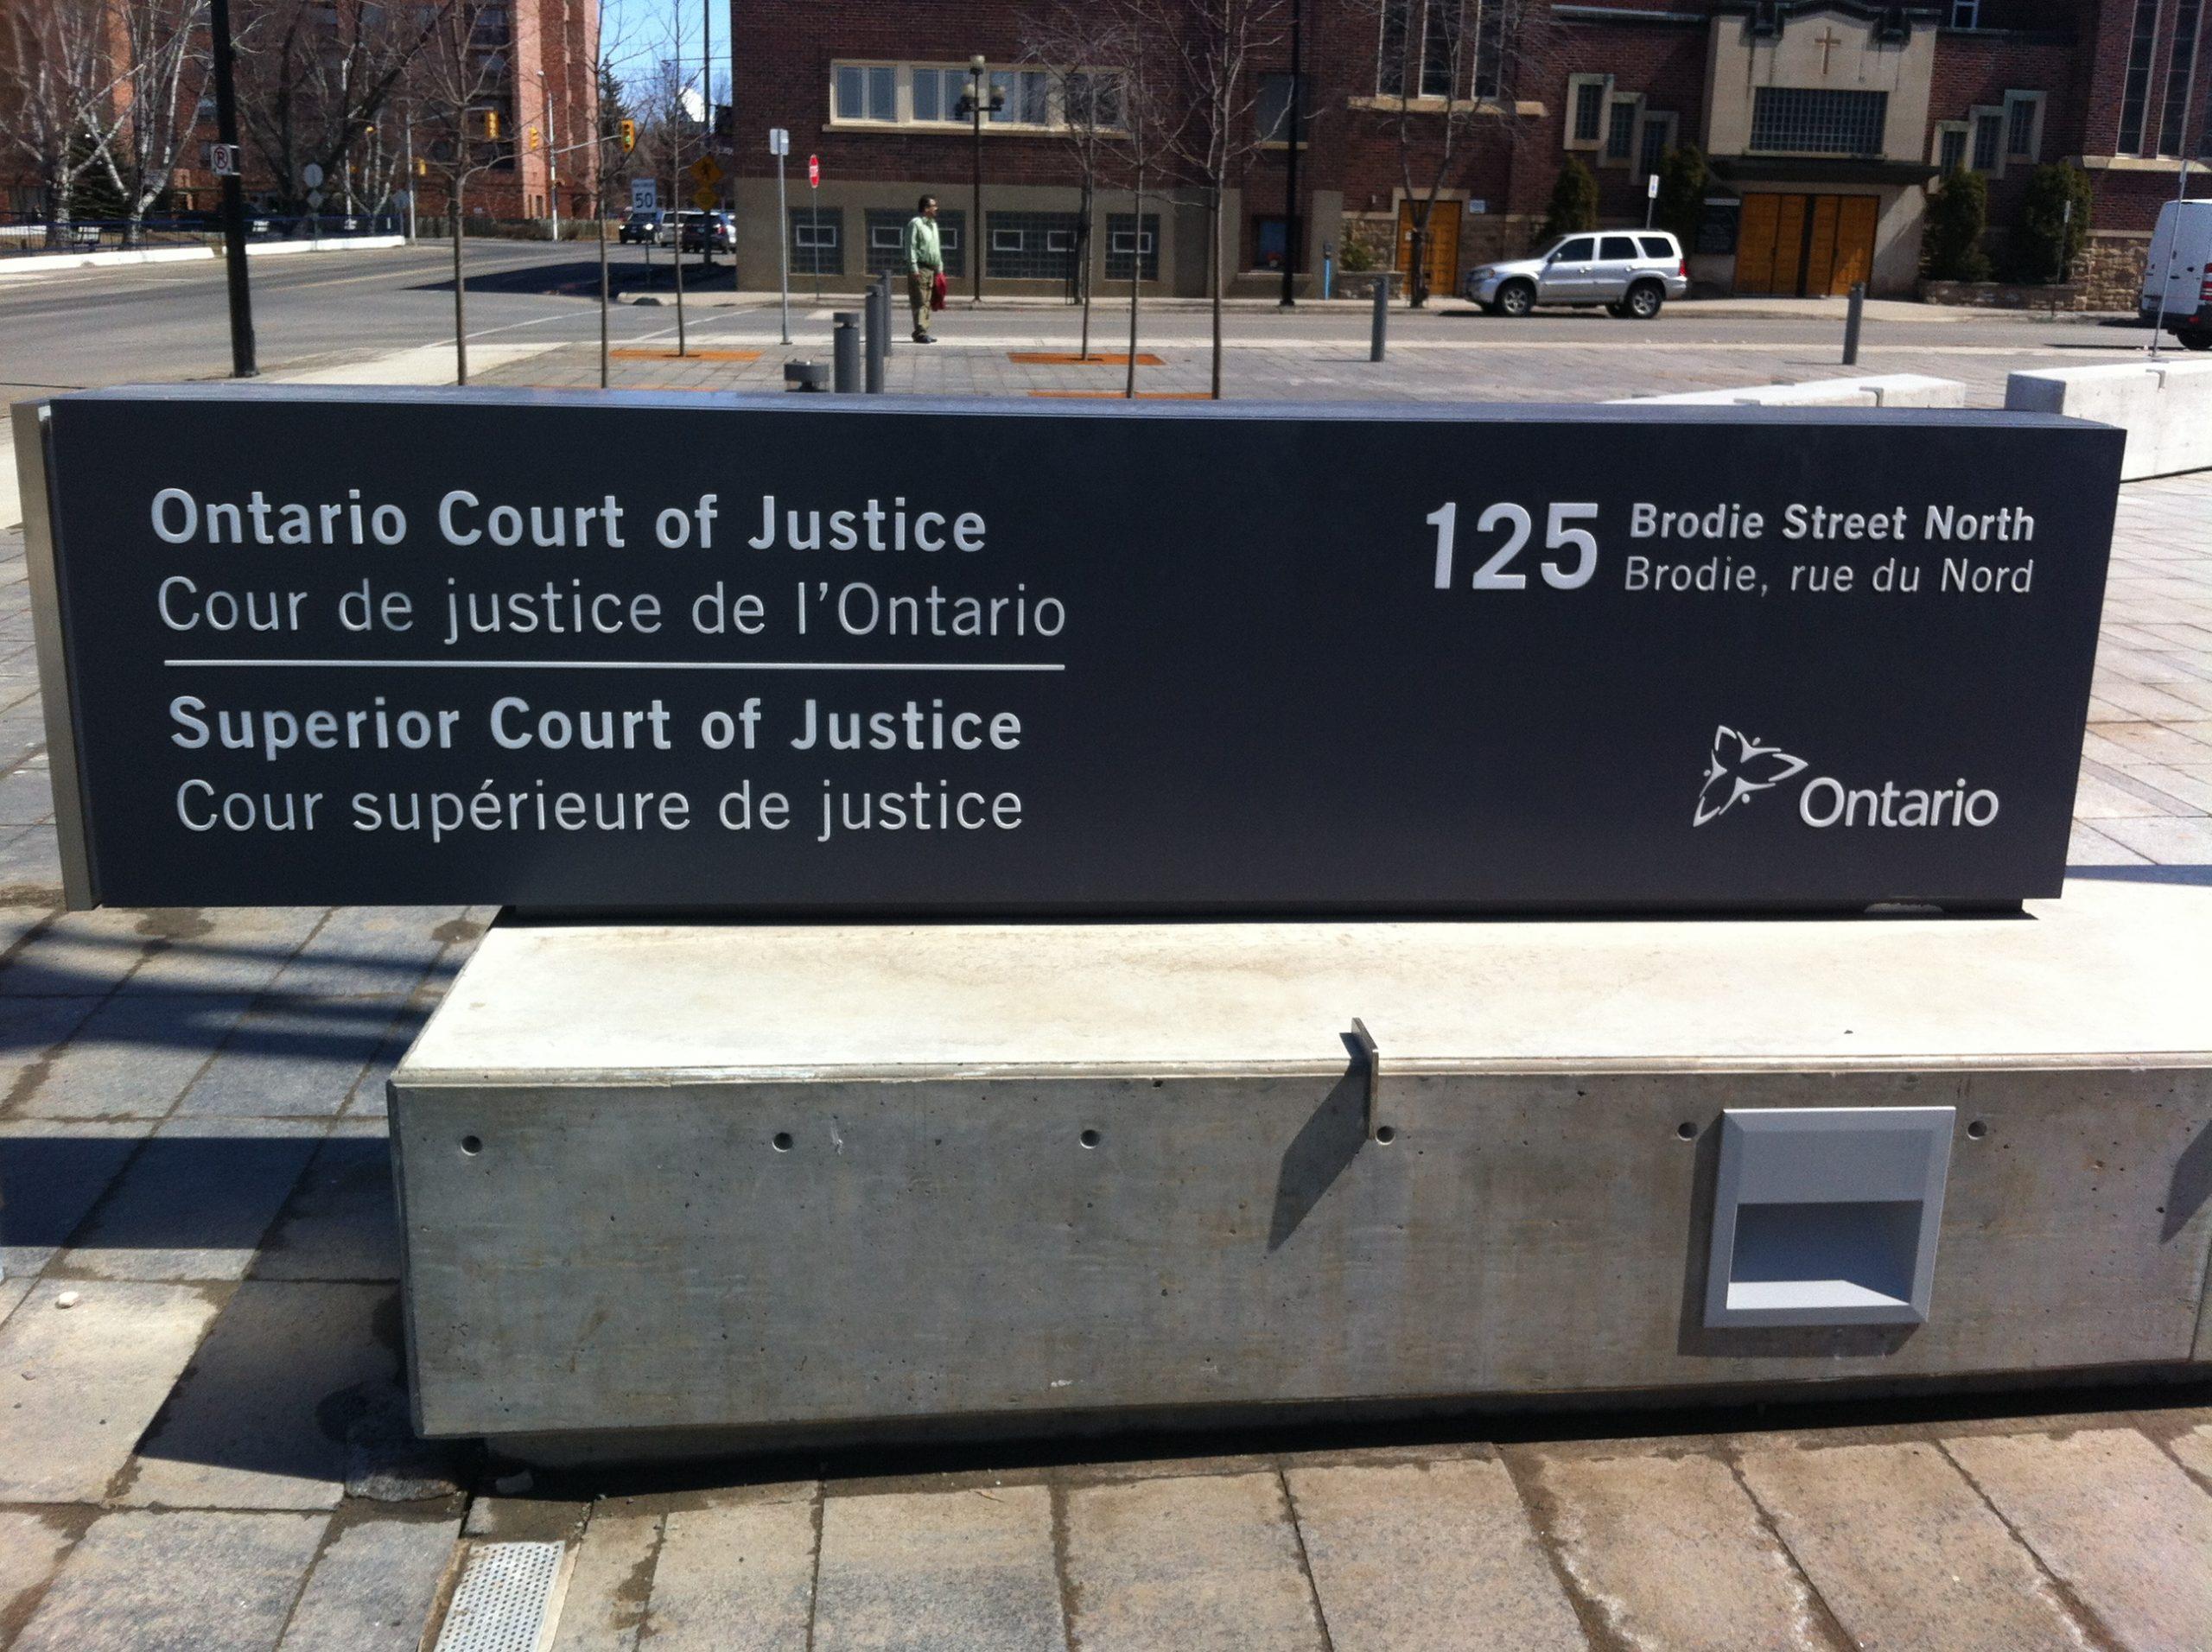 B&E, Assault Case Back In Court